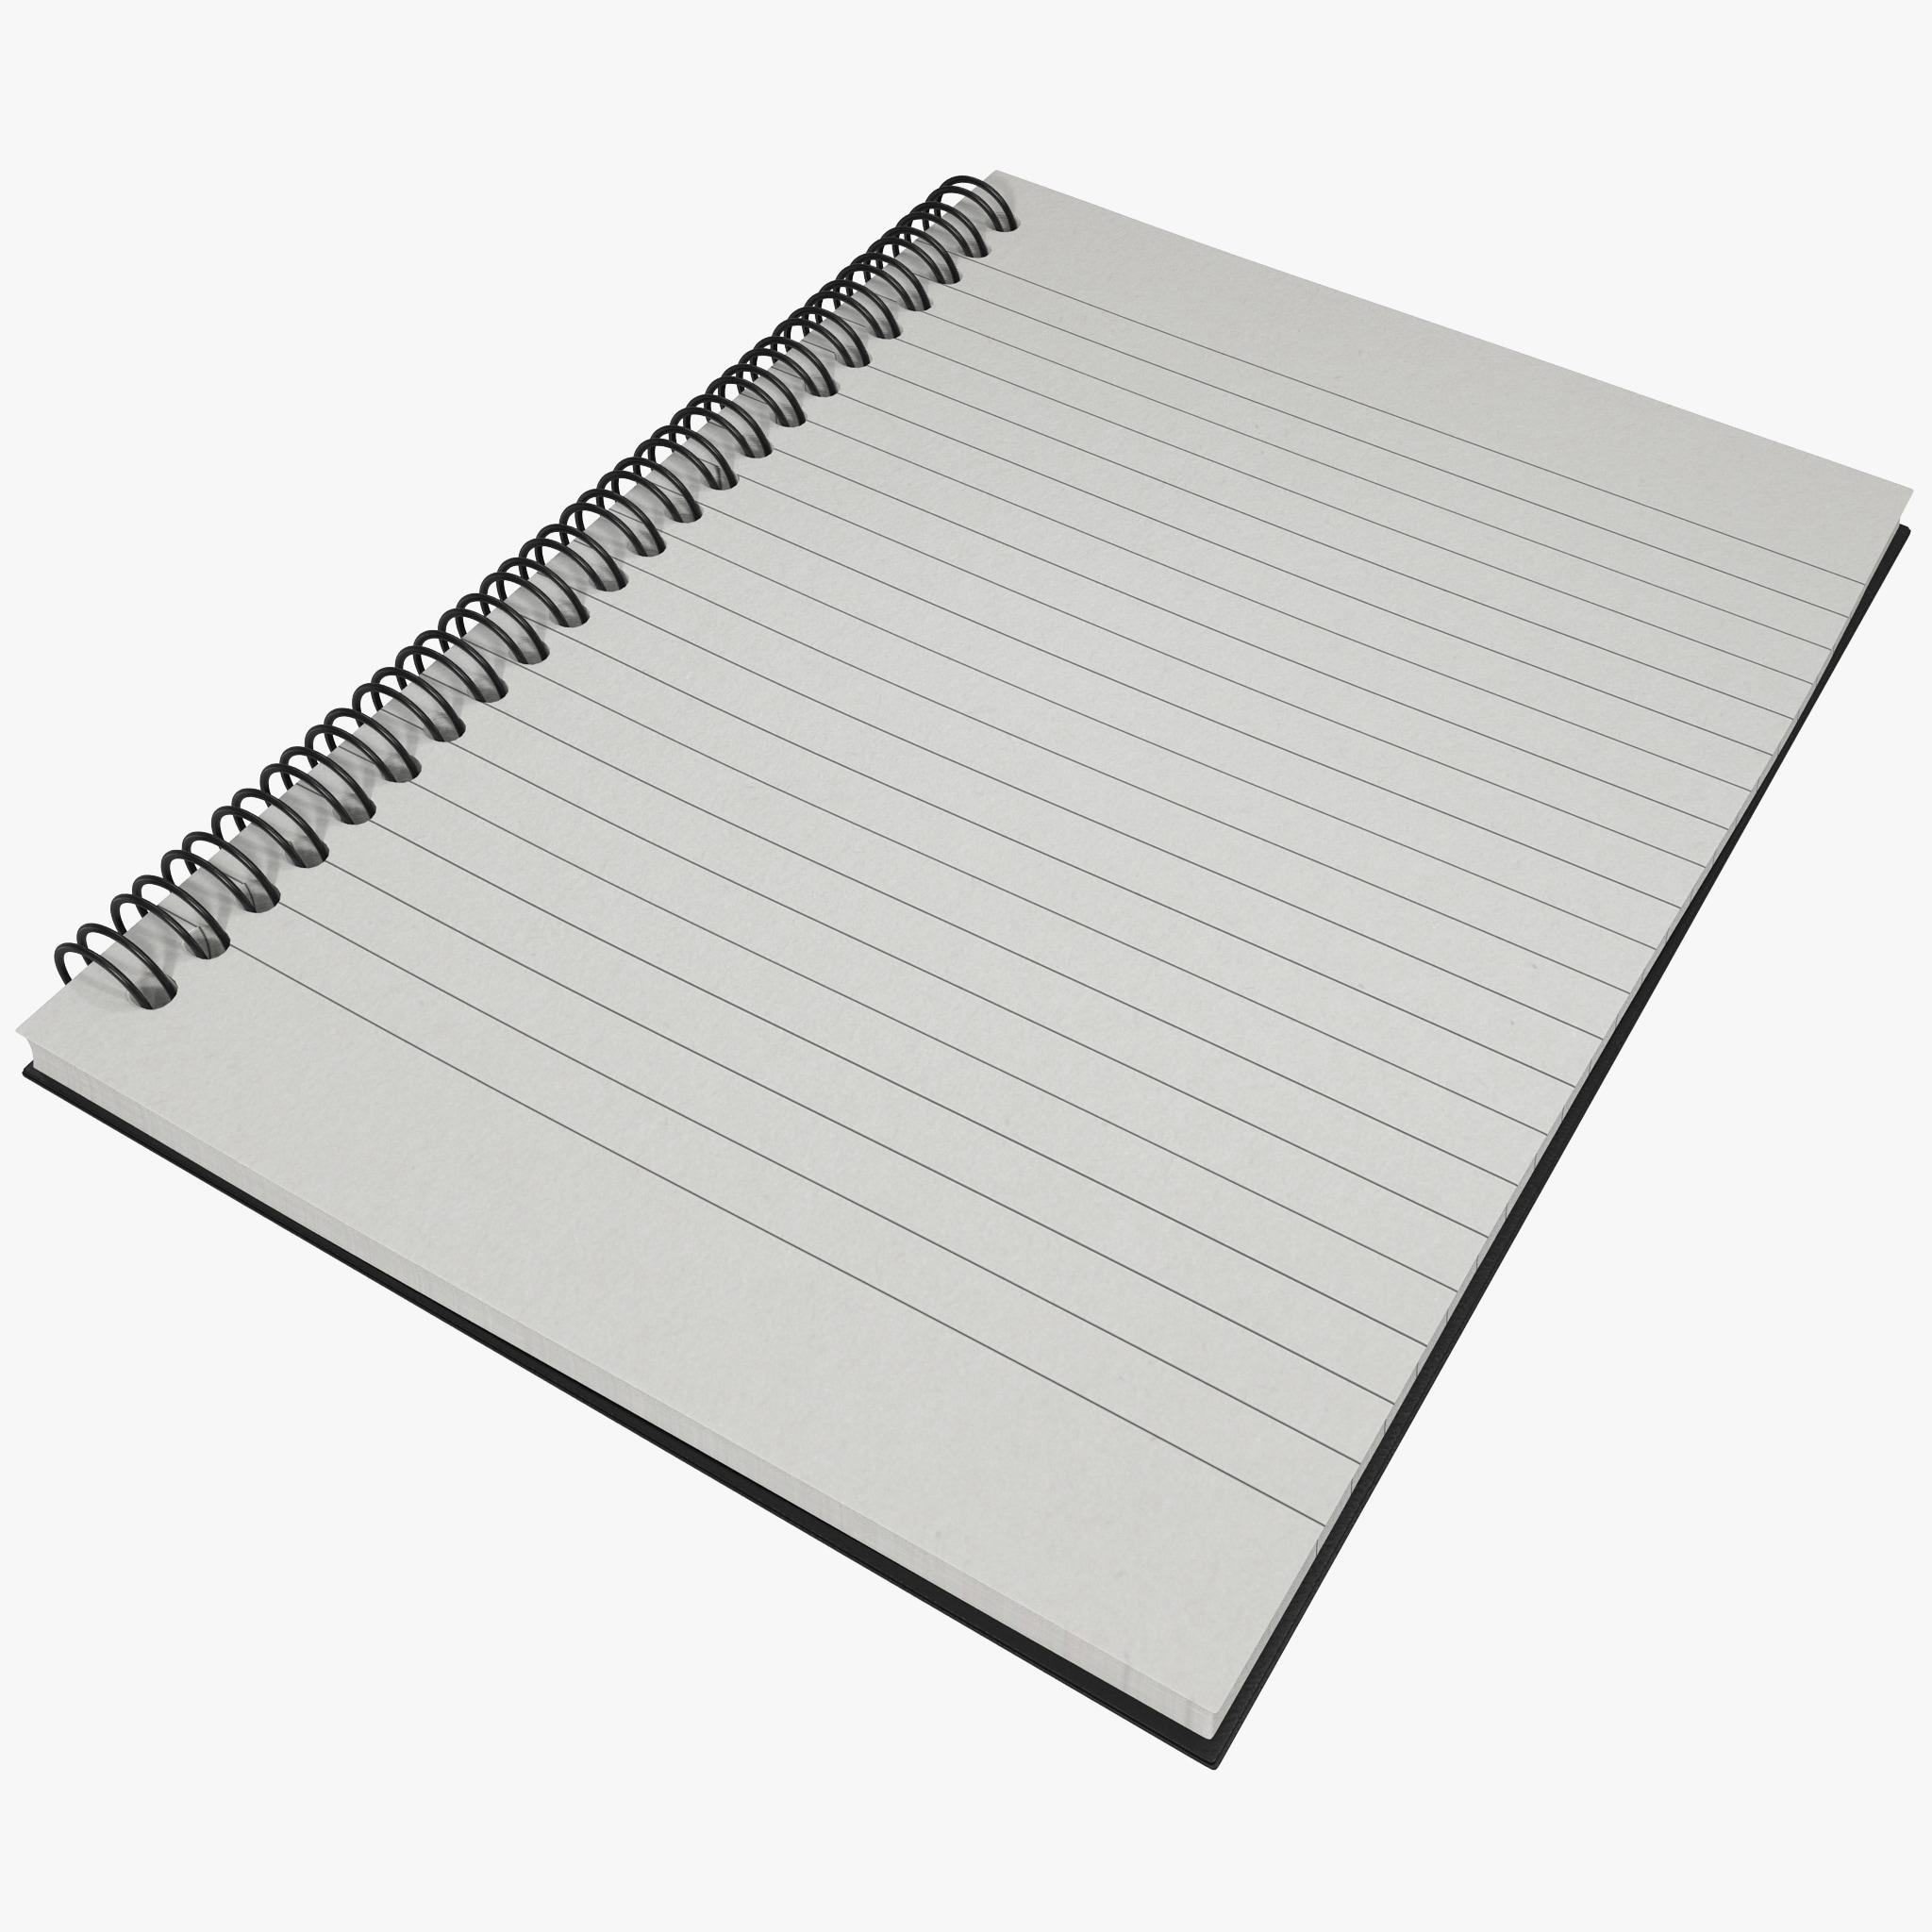 Notebook 2_1.jpg